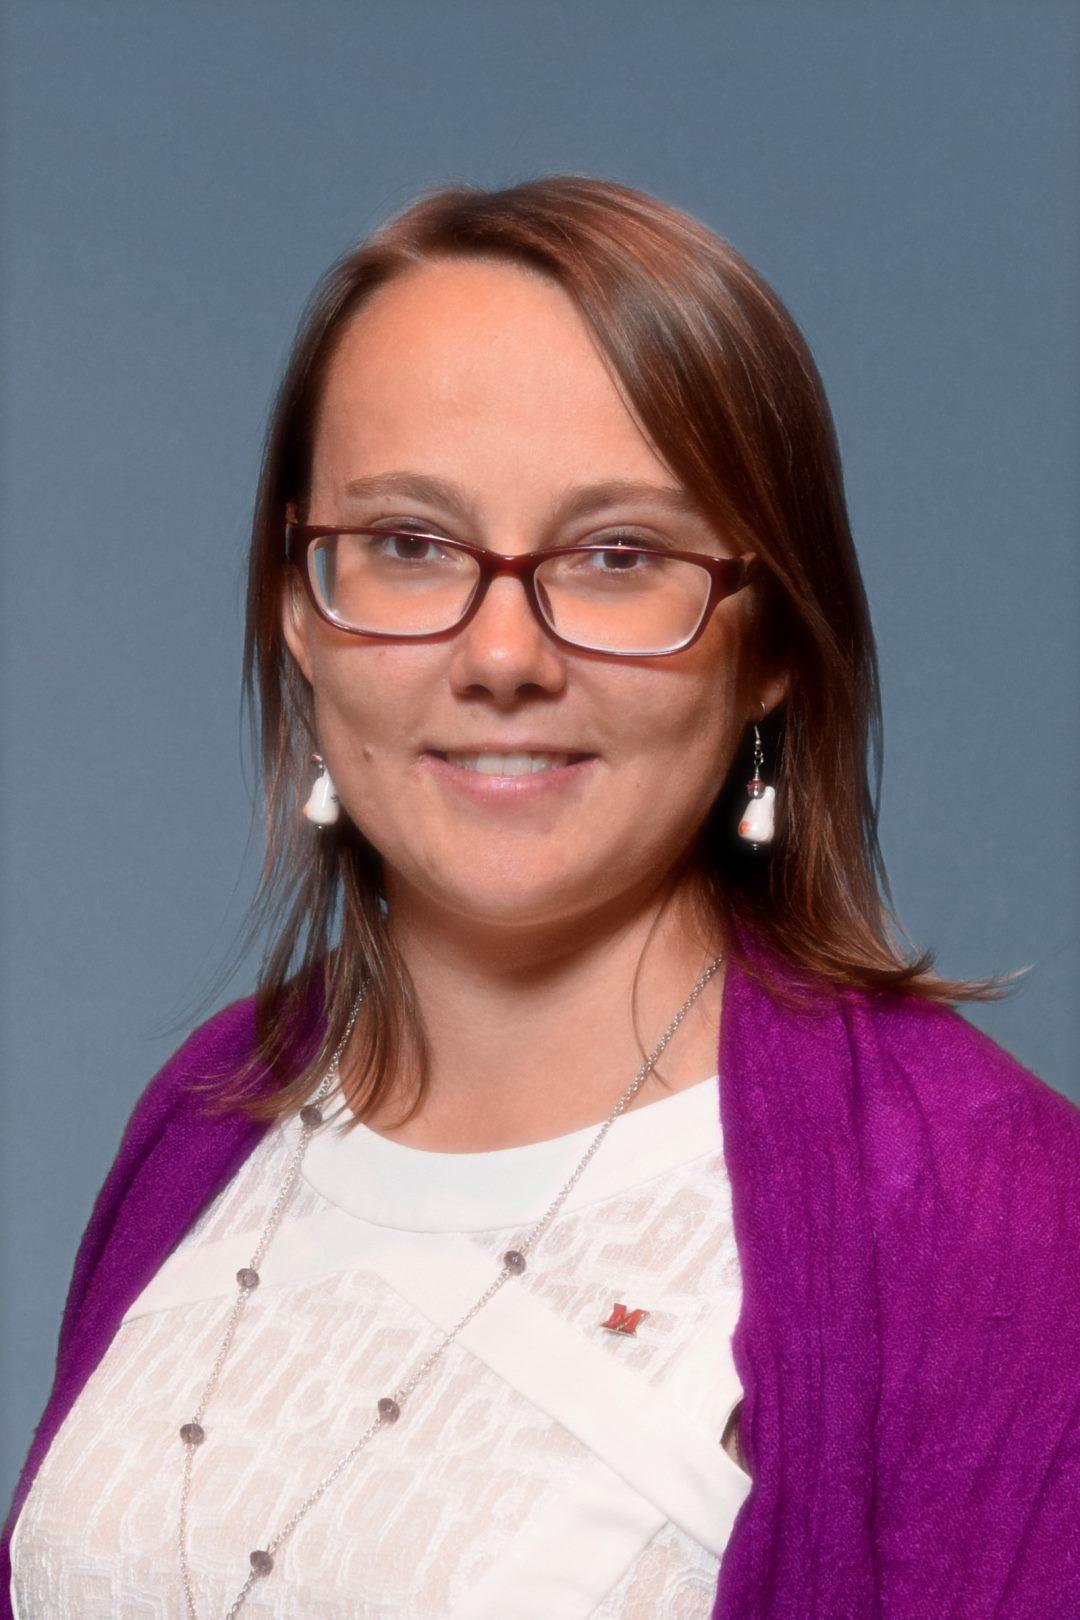 Elizabeth Jenike